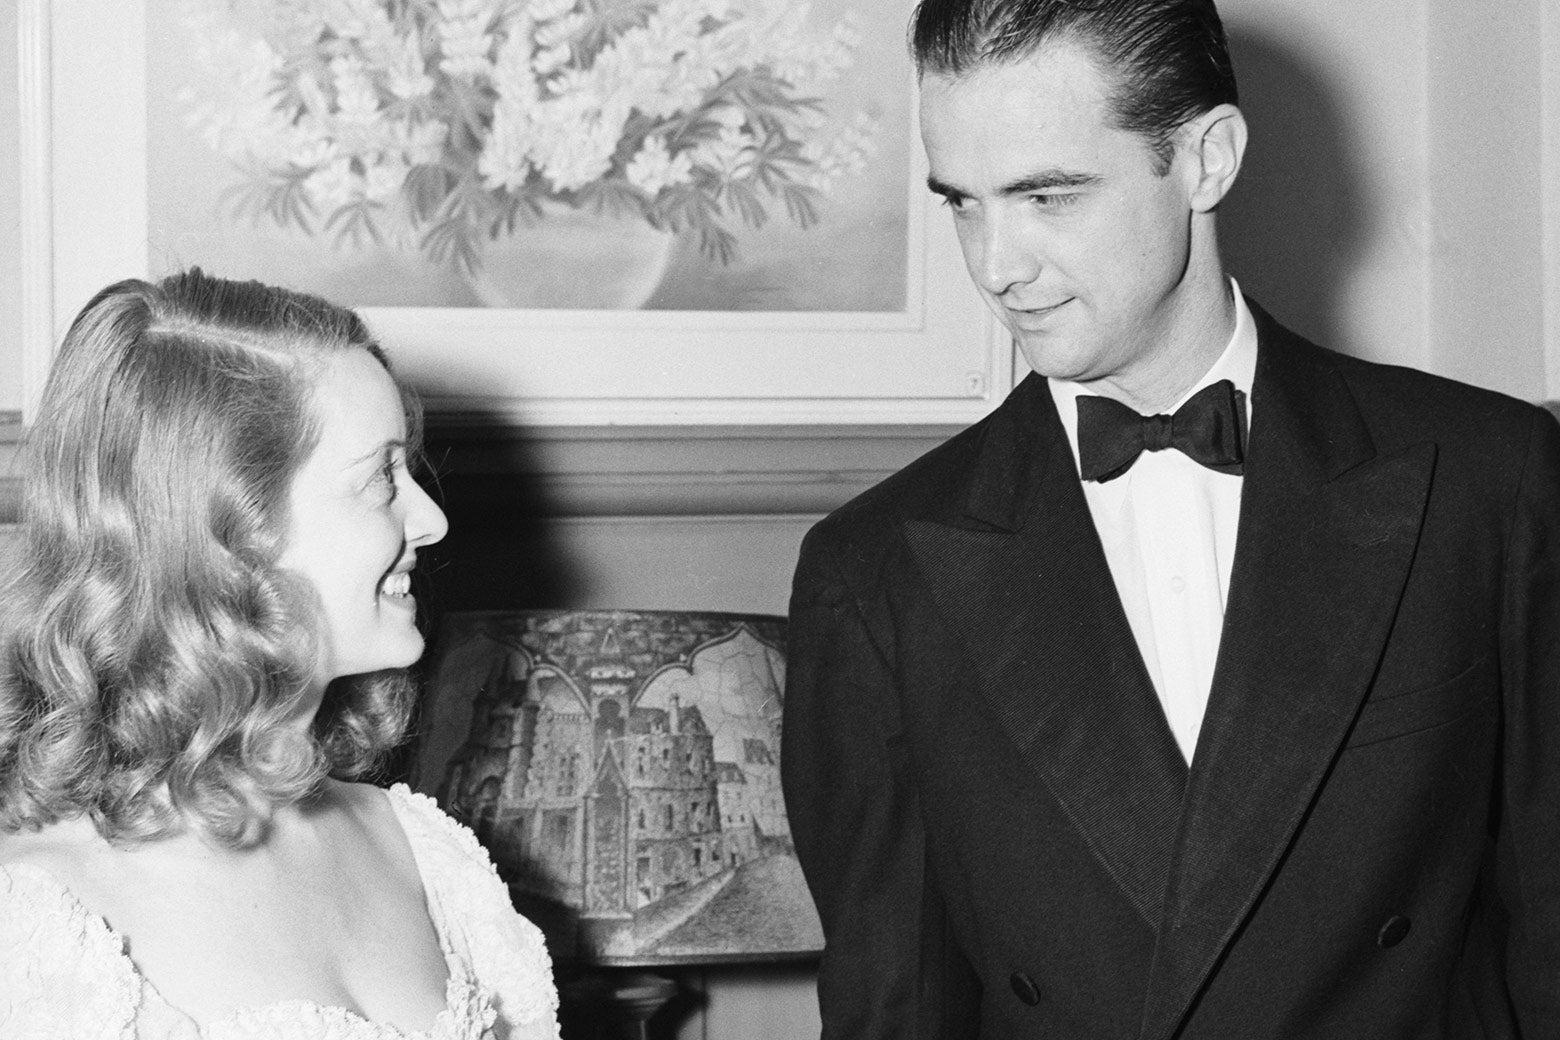 Bette Davis and Howard Hughes looking flirty.